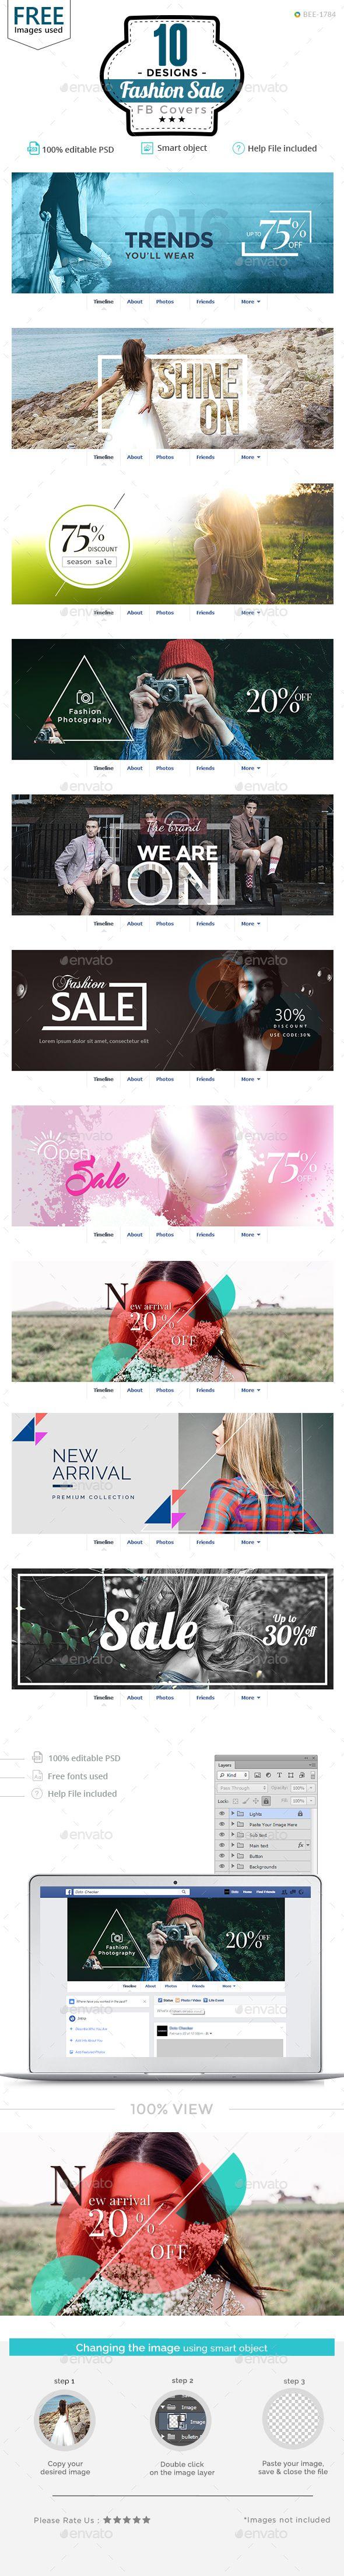 Fashion Sale Facebook Covers - 10 Designs